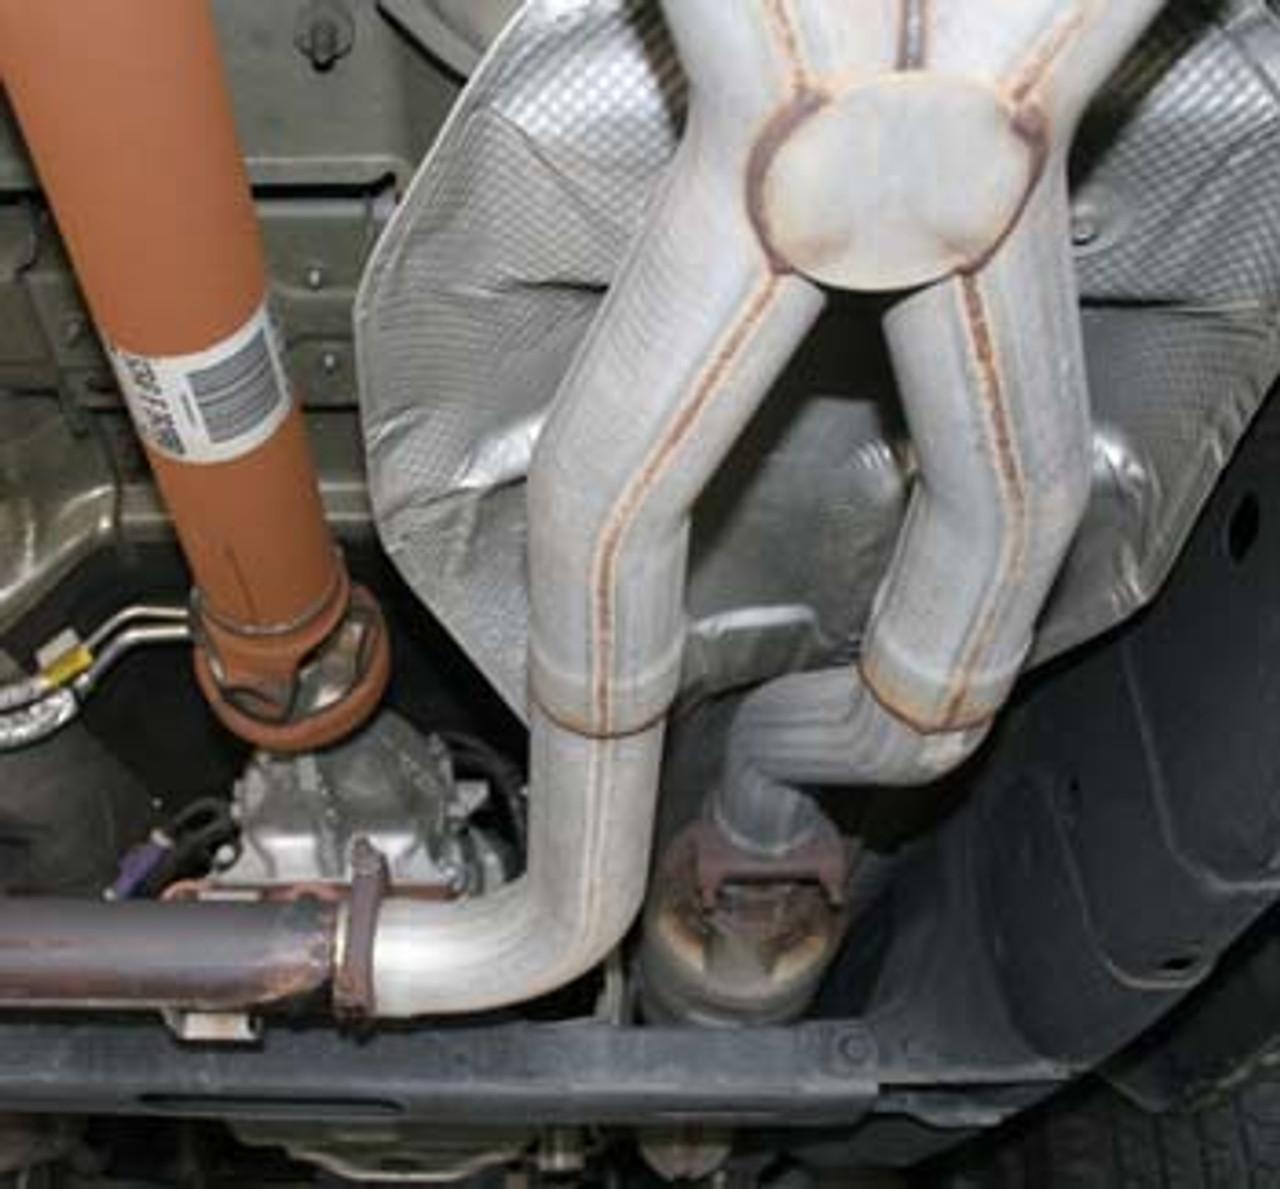 Ford F150 True Dual X  Side Exit System